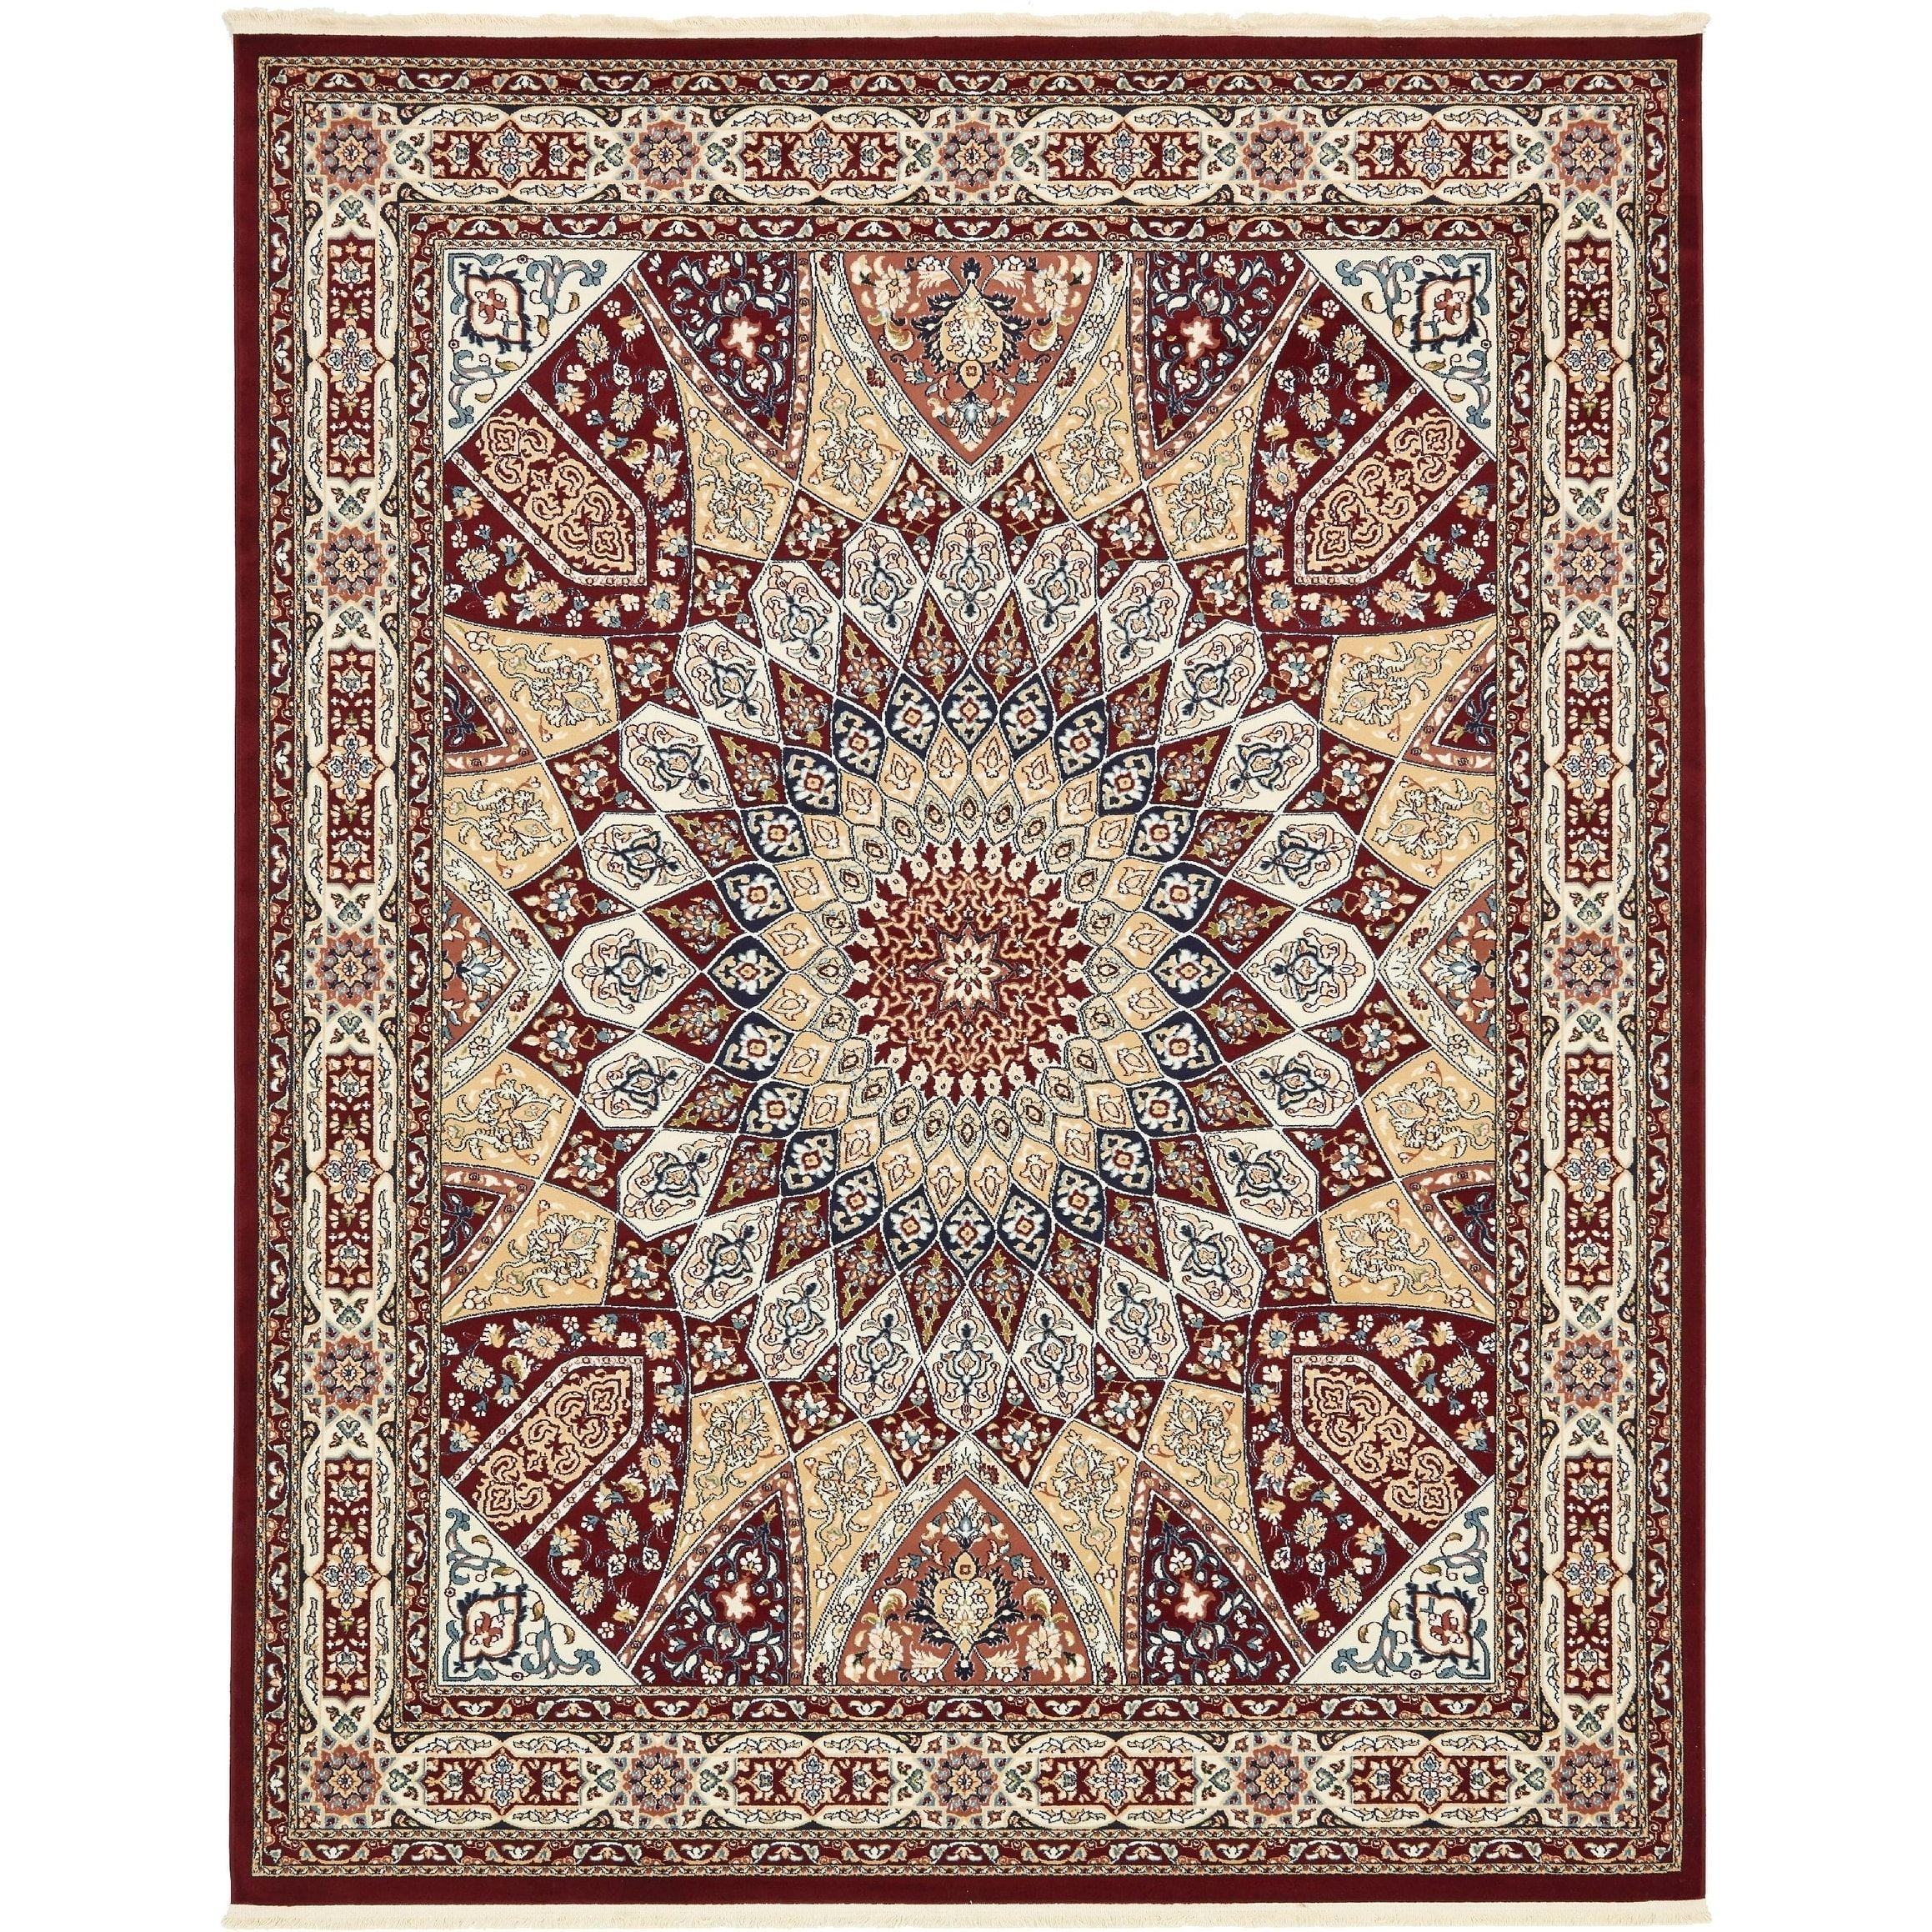 Breathtaking Large Geometric Red 10x12 Bakhtiari Persian: Burgundy Area Rugs 8 X 10